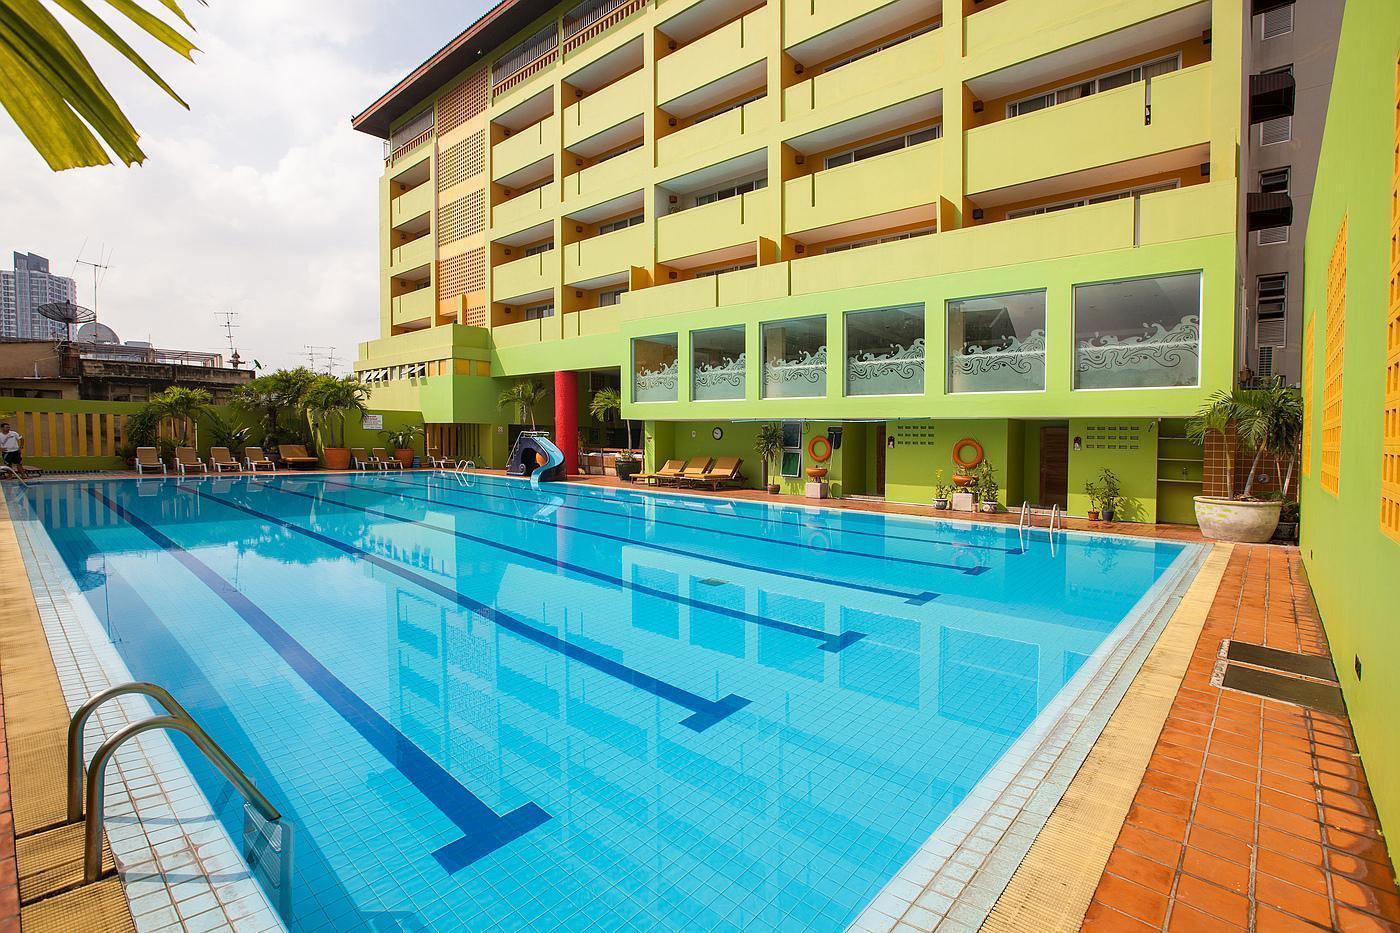 The Aiyapura Bangkok โรงแรมอัยยะปุระ กรุงเทพฯ